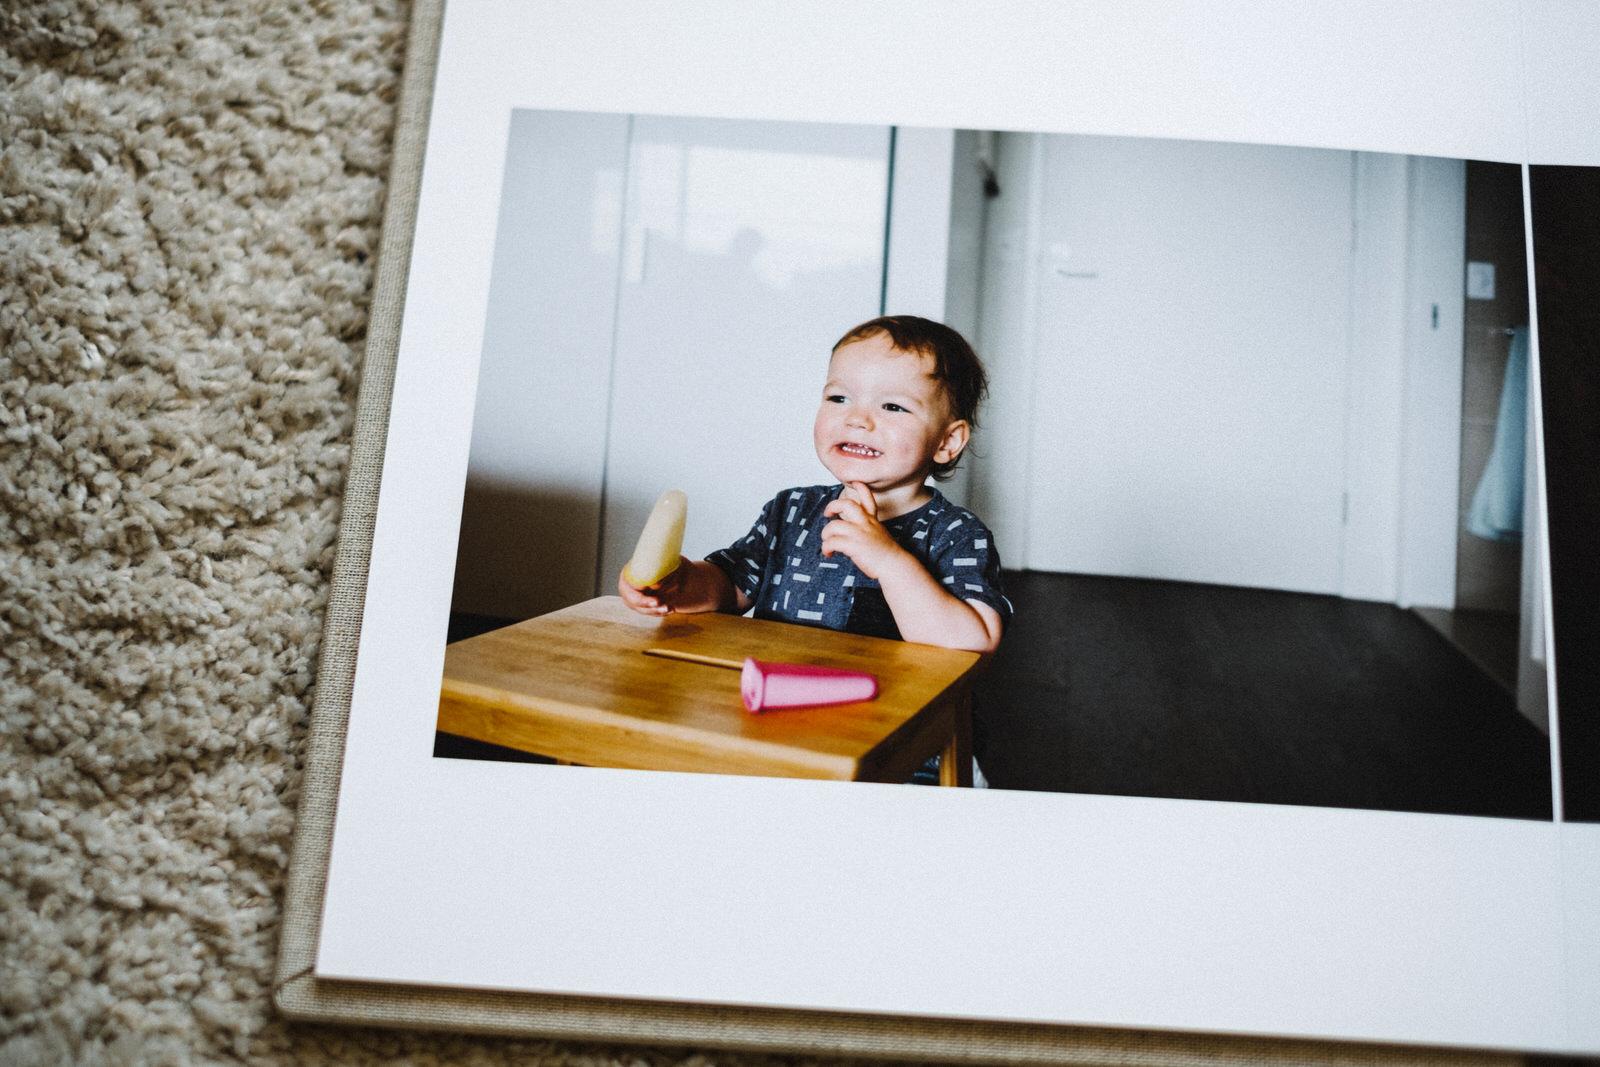 family-story-photos-photo-album-08.jpg